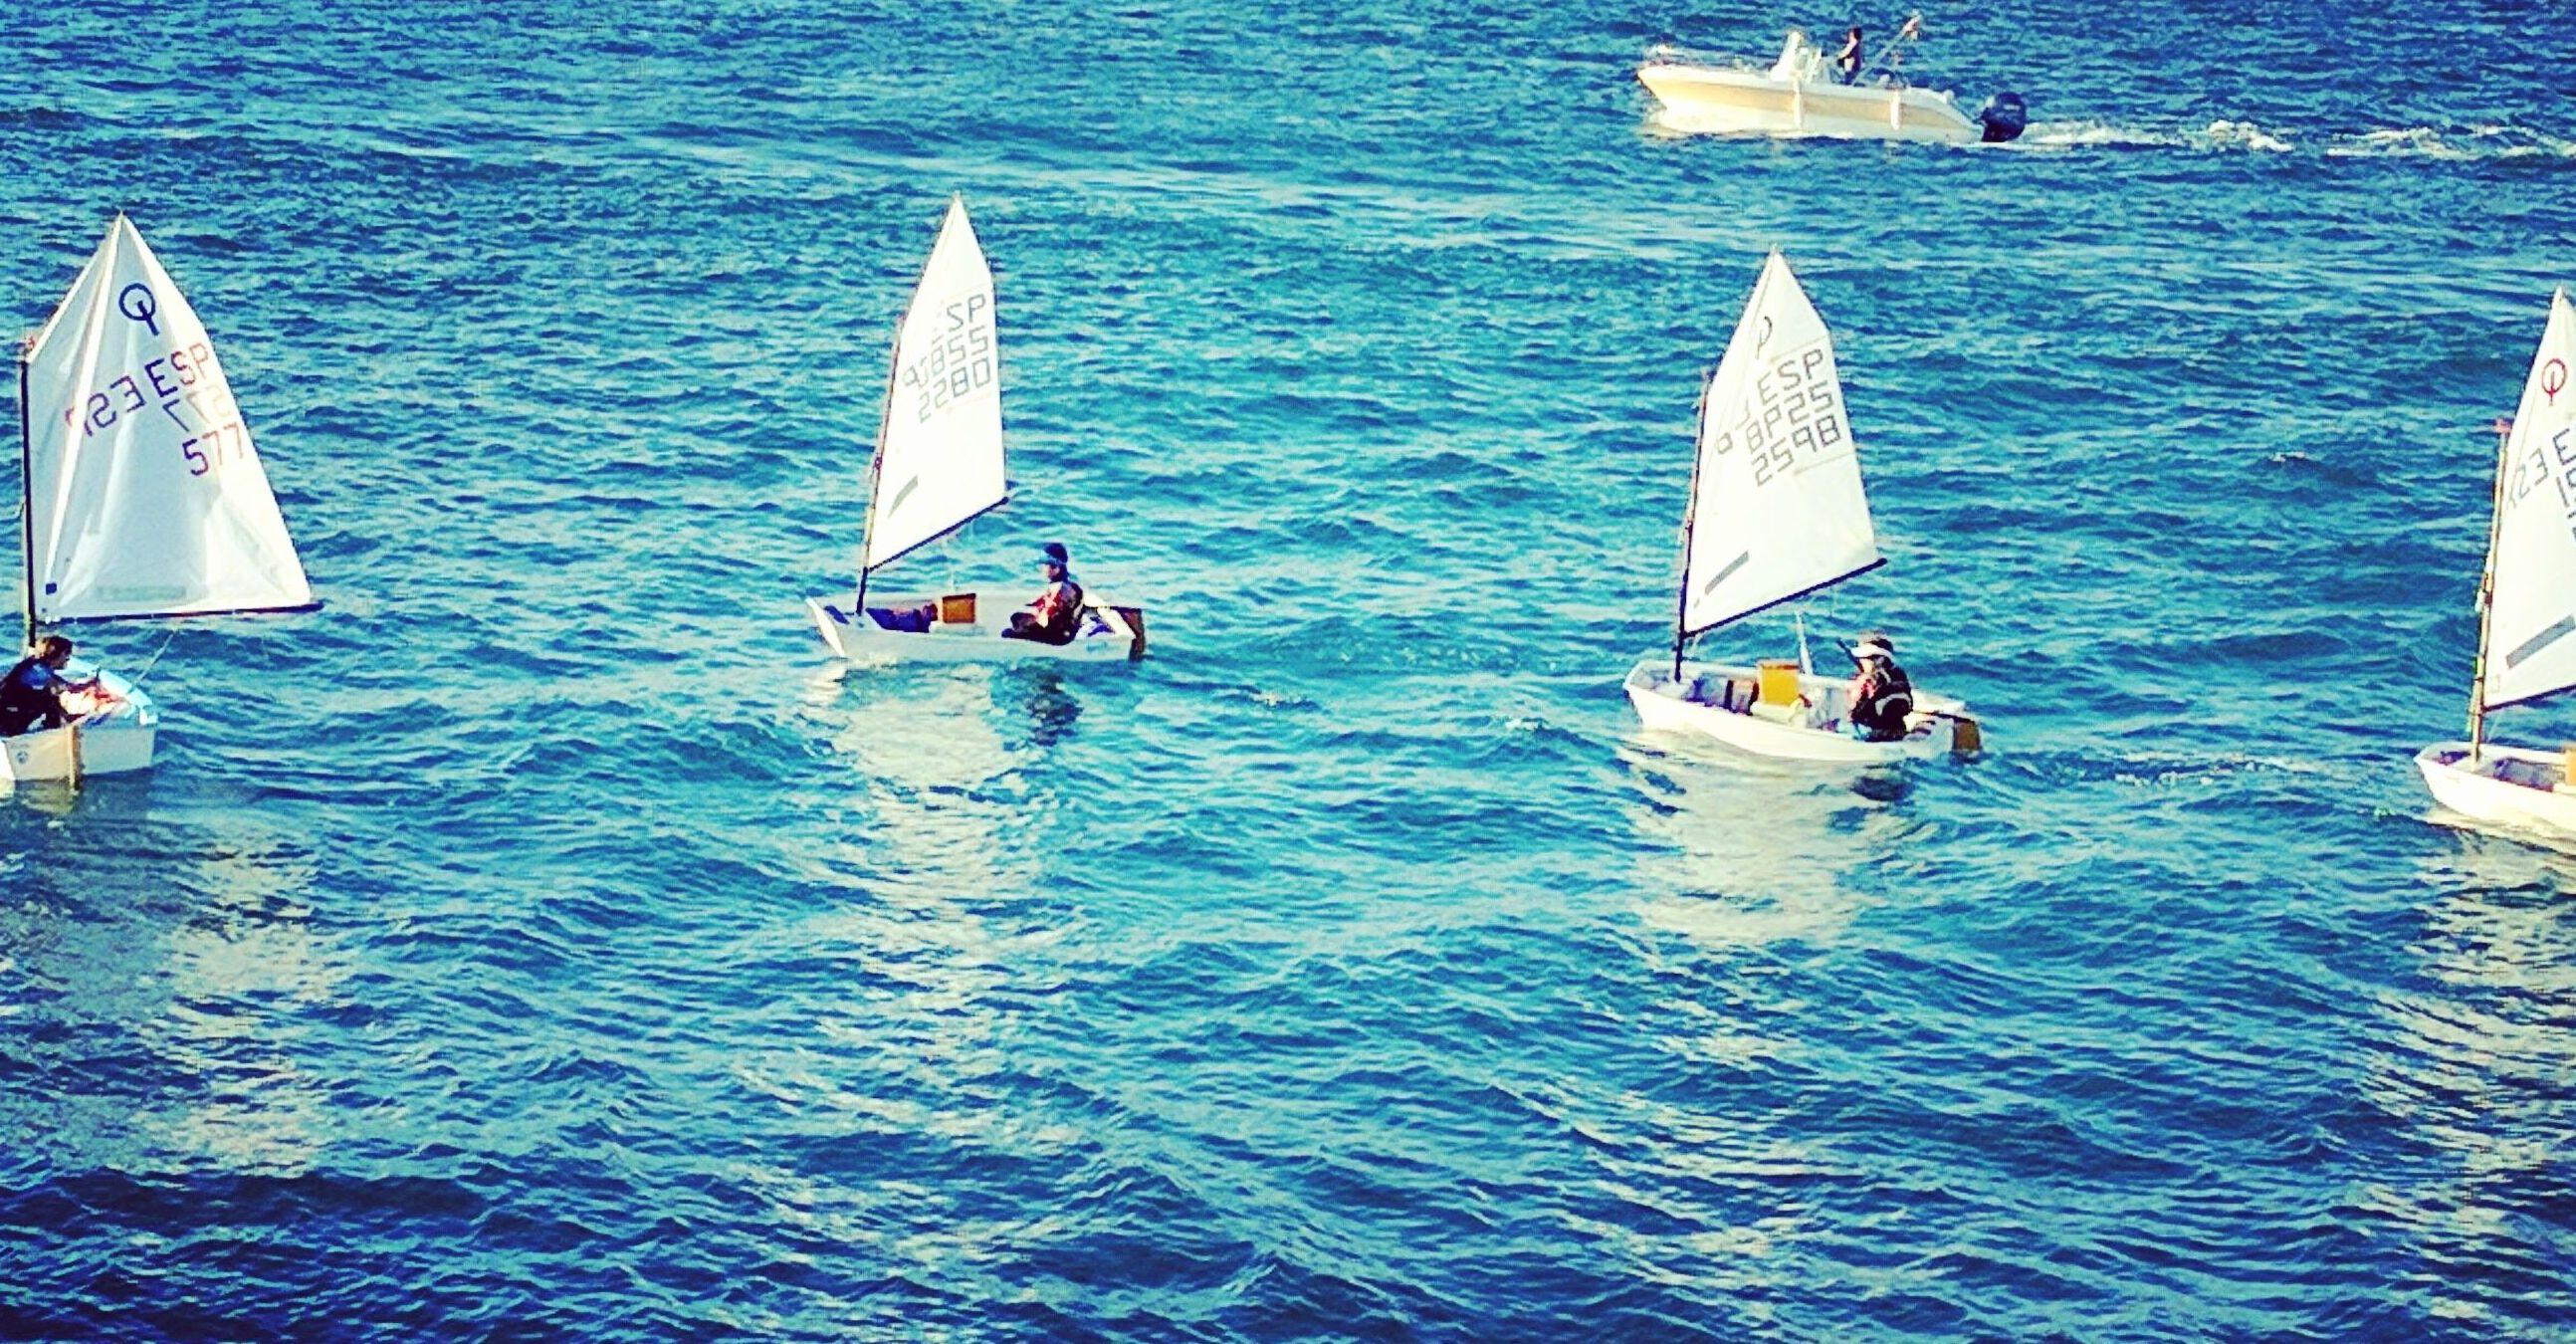 Foto 59 de Abogados en Eivissa | Raad Abogados. Tel 691 270 993